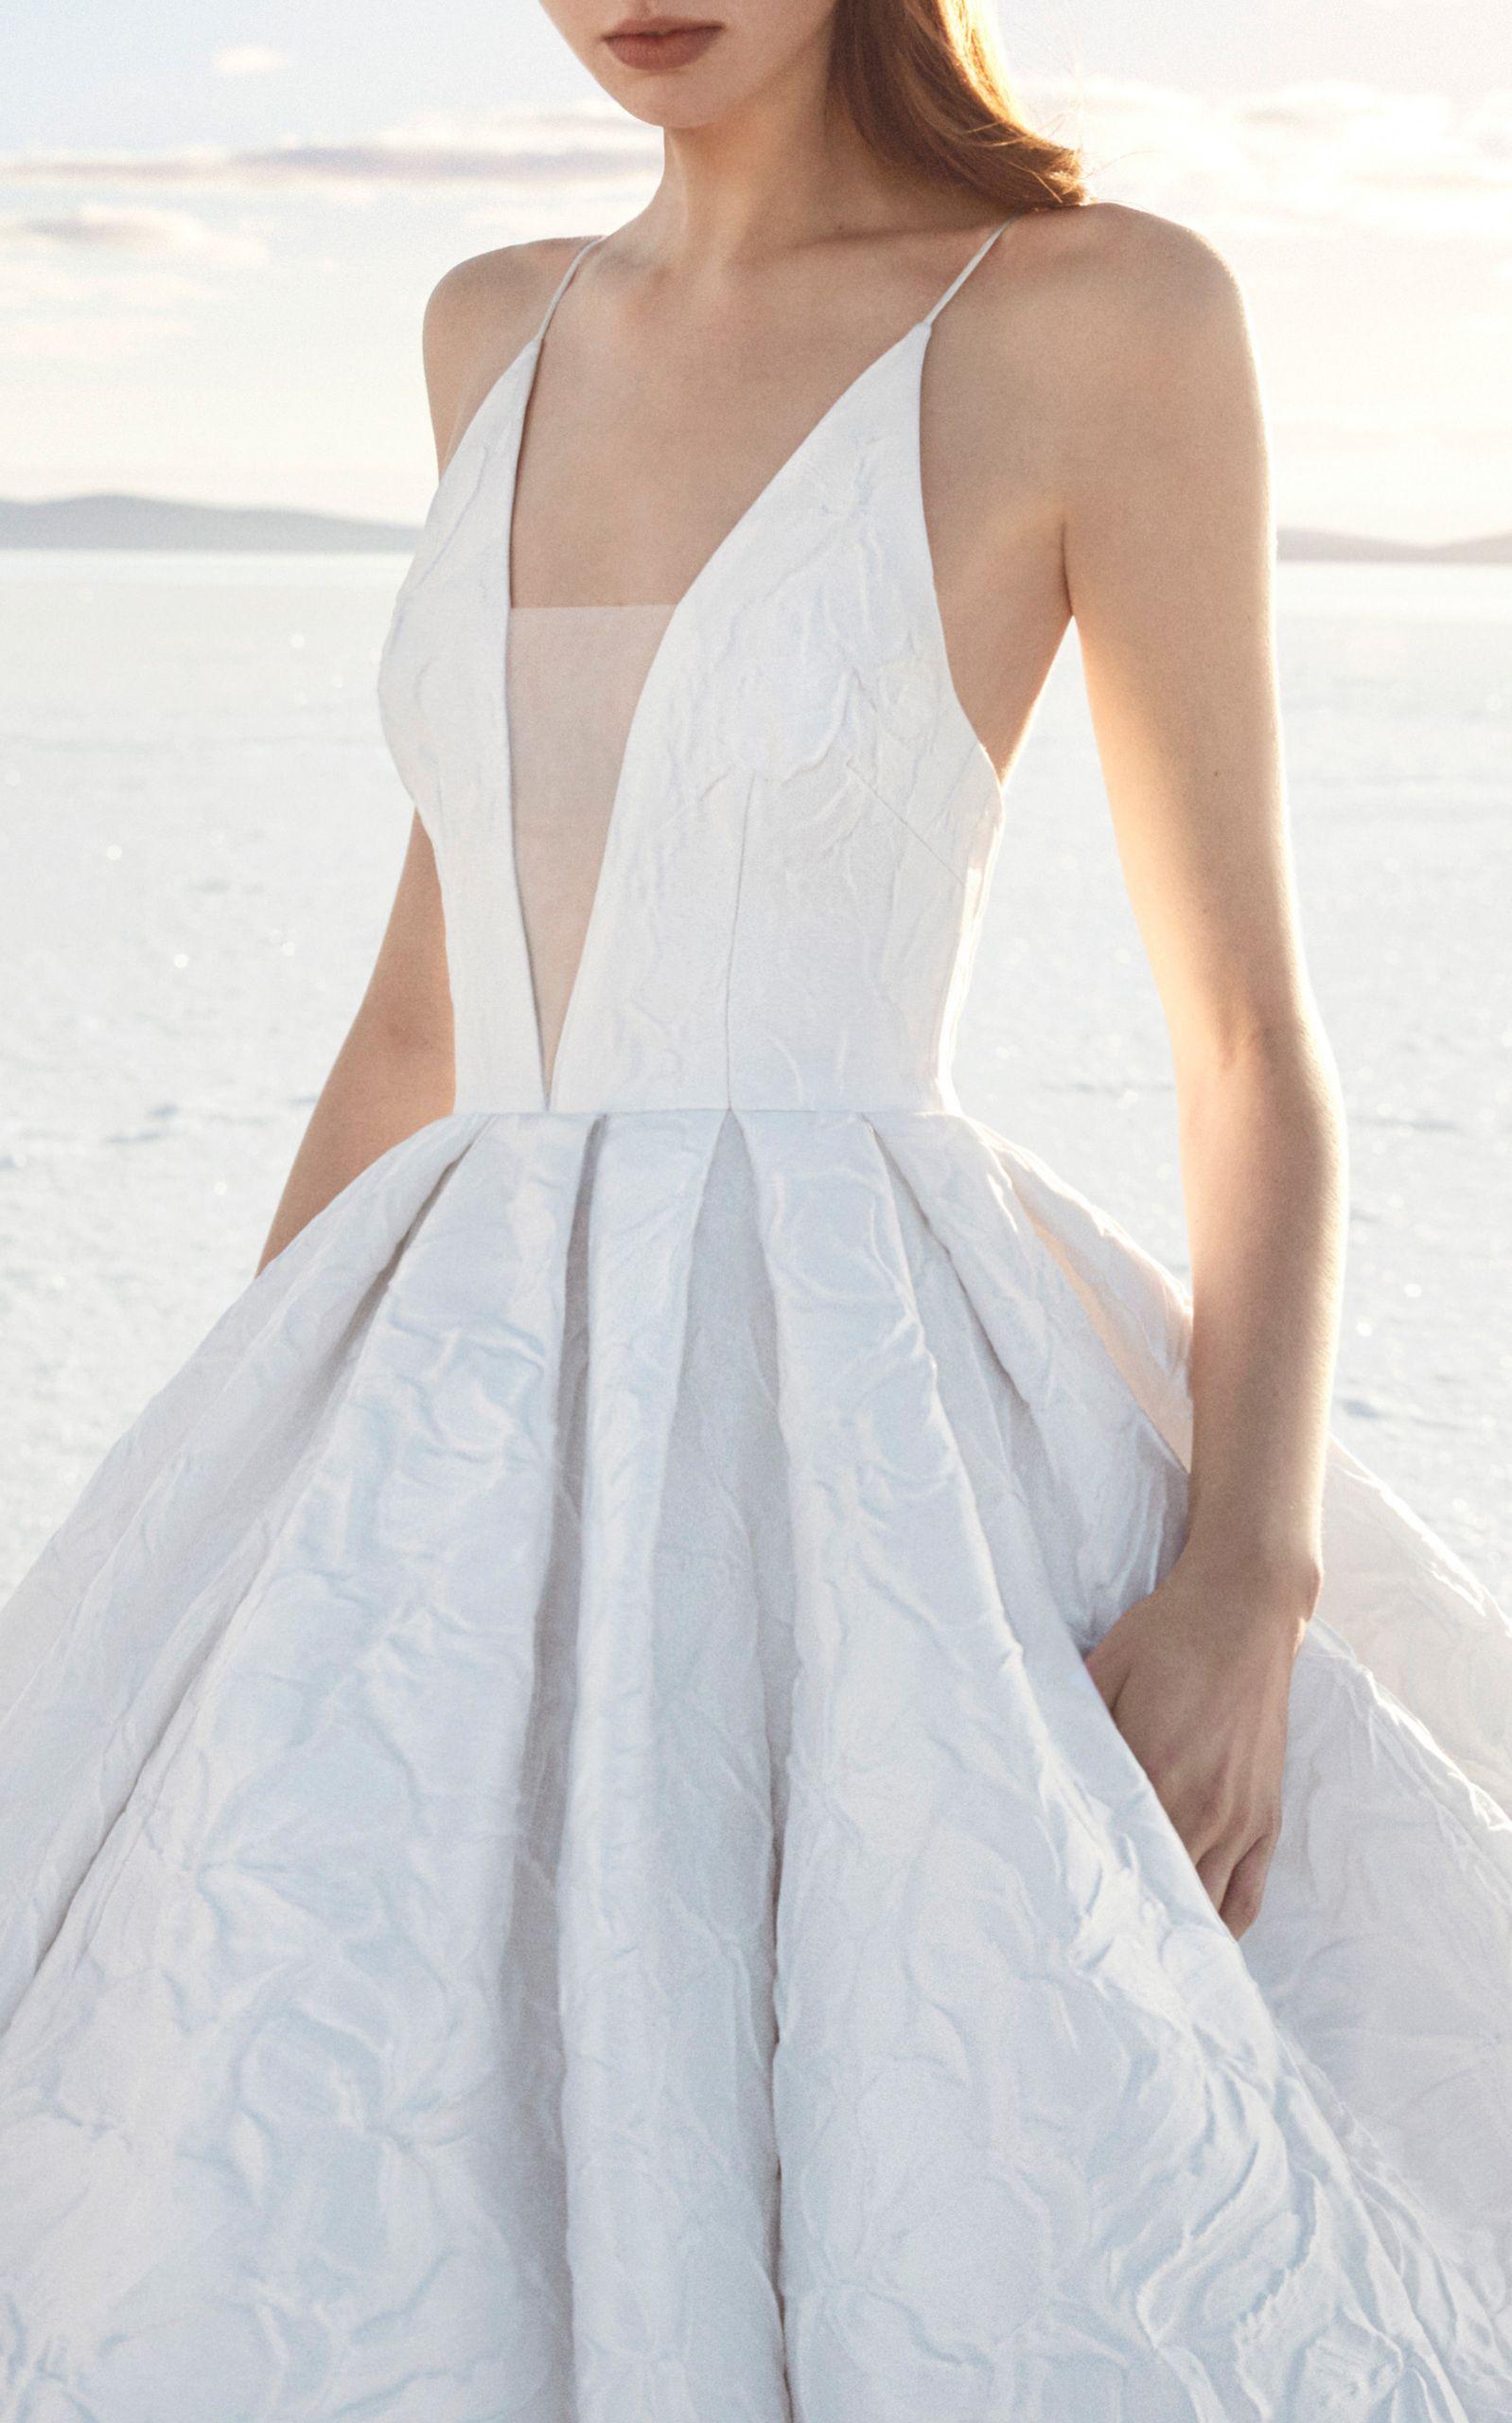 ad28675a4ab Alex Perry Bride Sienna Floral Brocade Gown